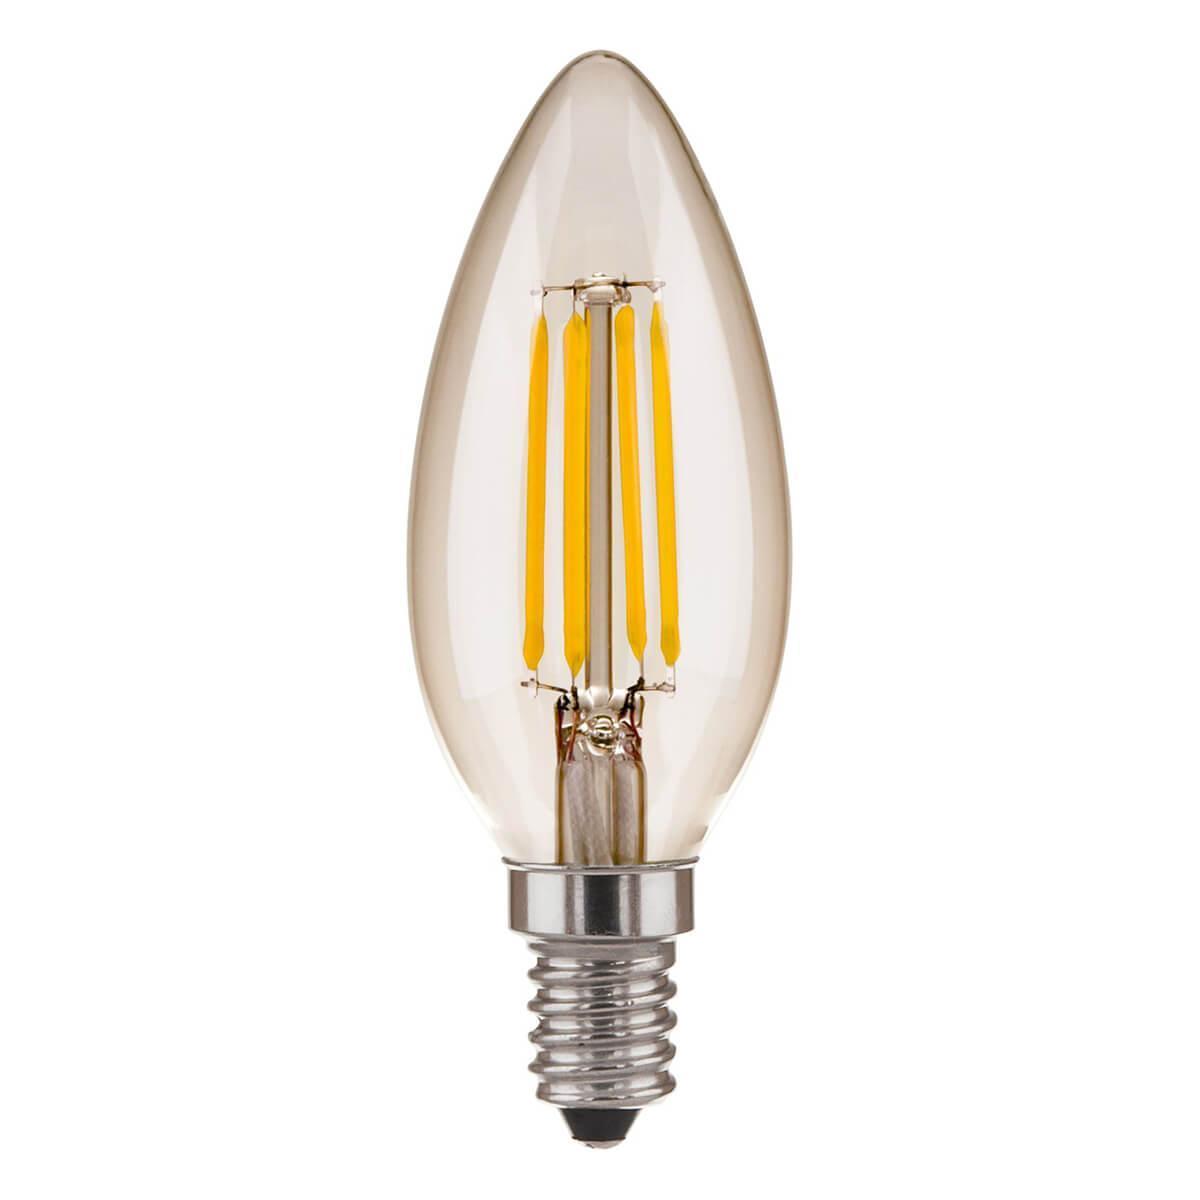 Лампа светодиодная филаментная E14 6W 4200K прозрачная 4690389110764 lightstar лампа светодиодная lightstar кукуруза прозрачная e14 6w 4200k 940354